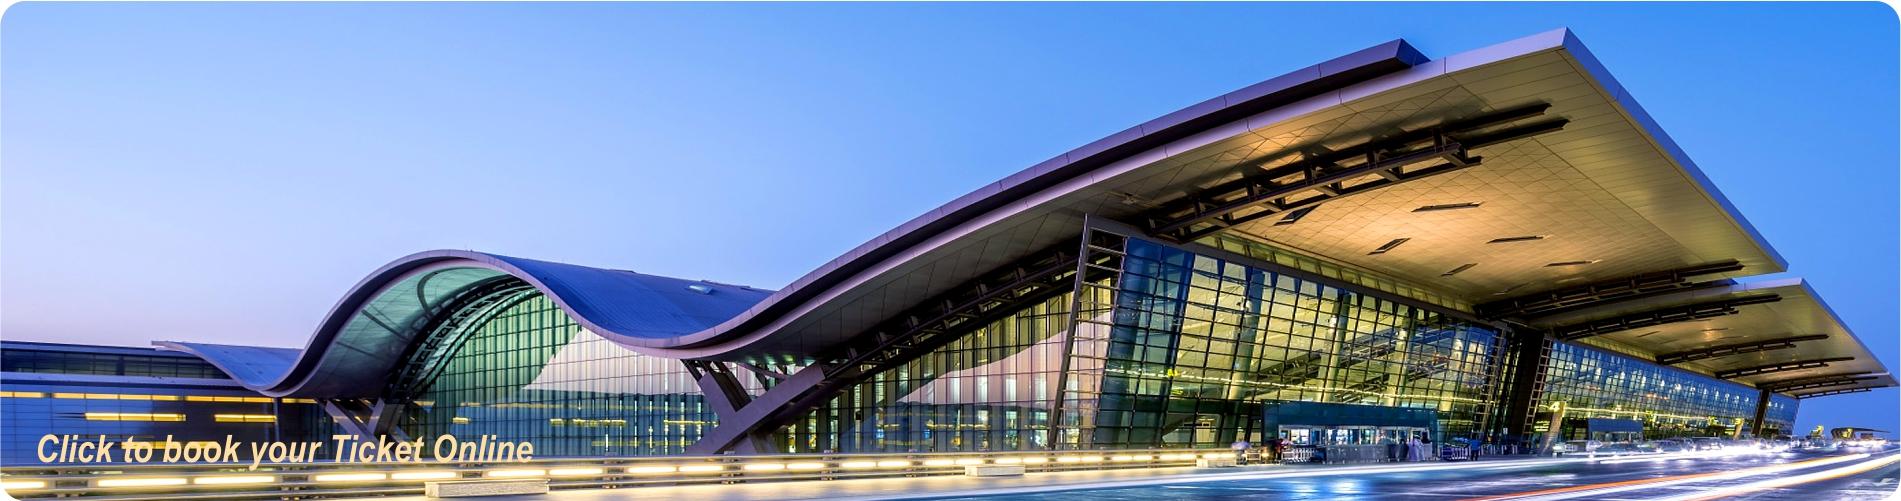 doha-airport International